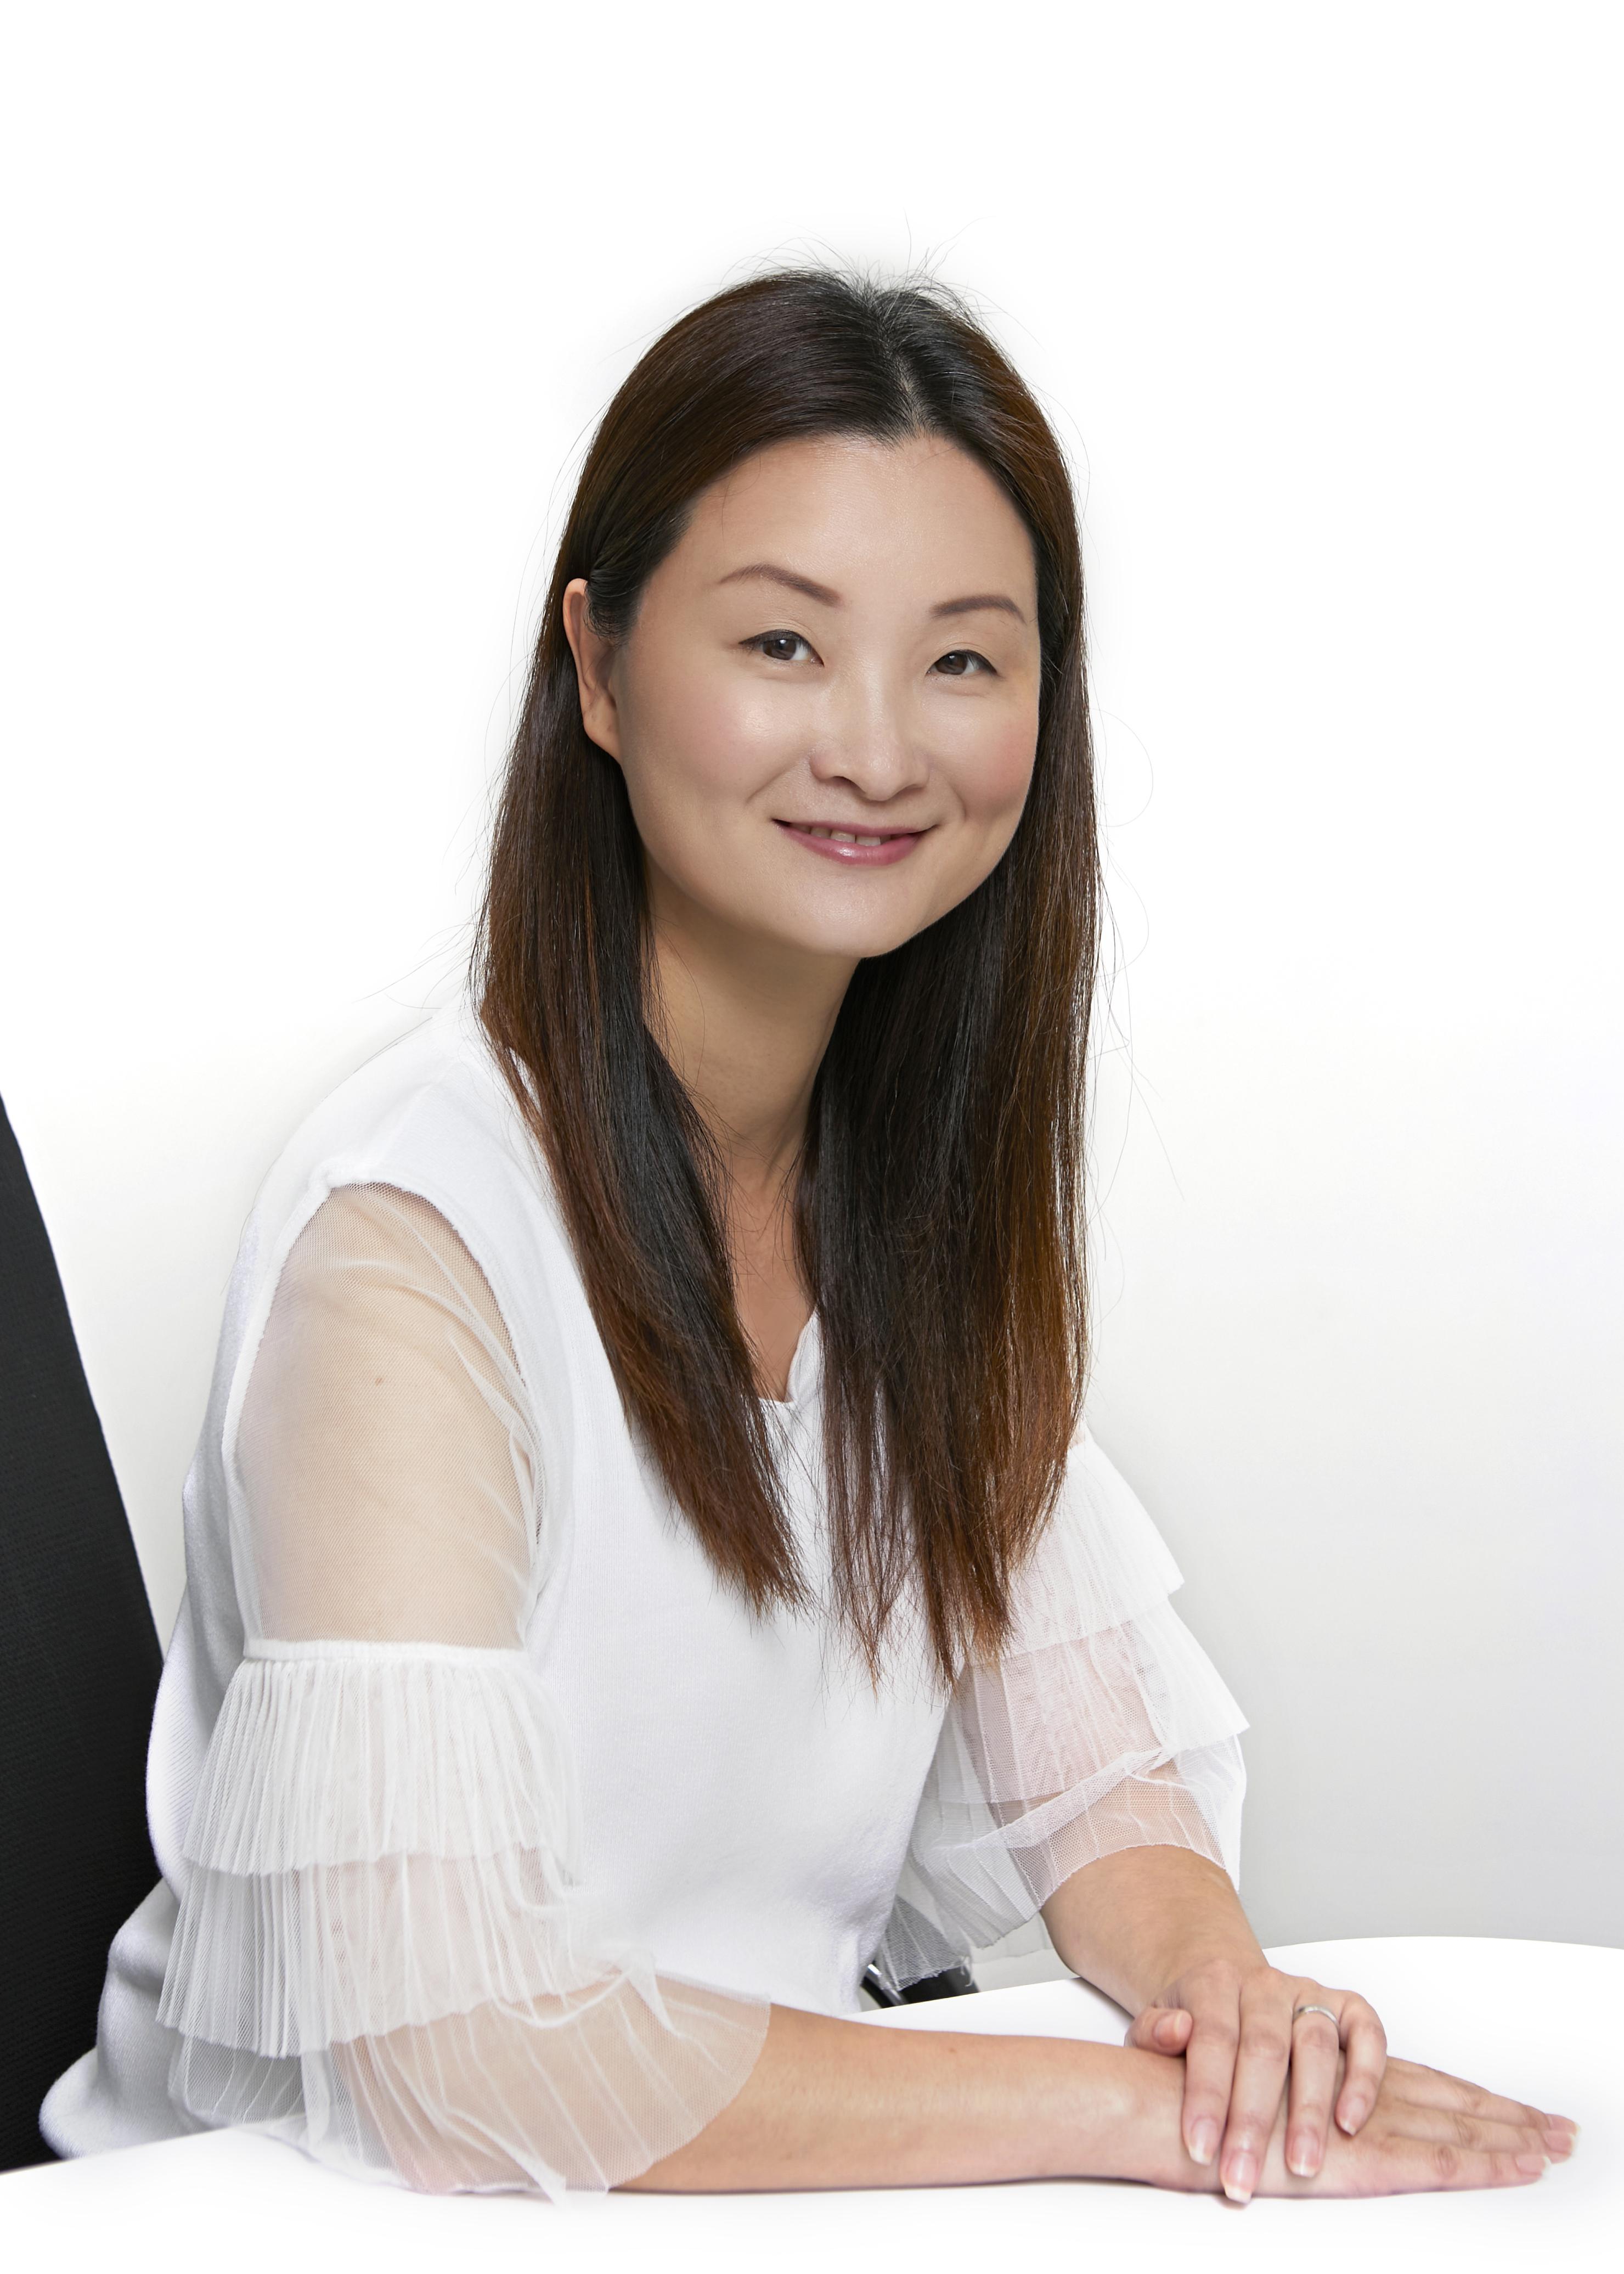 Vivian Kwong